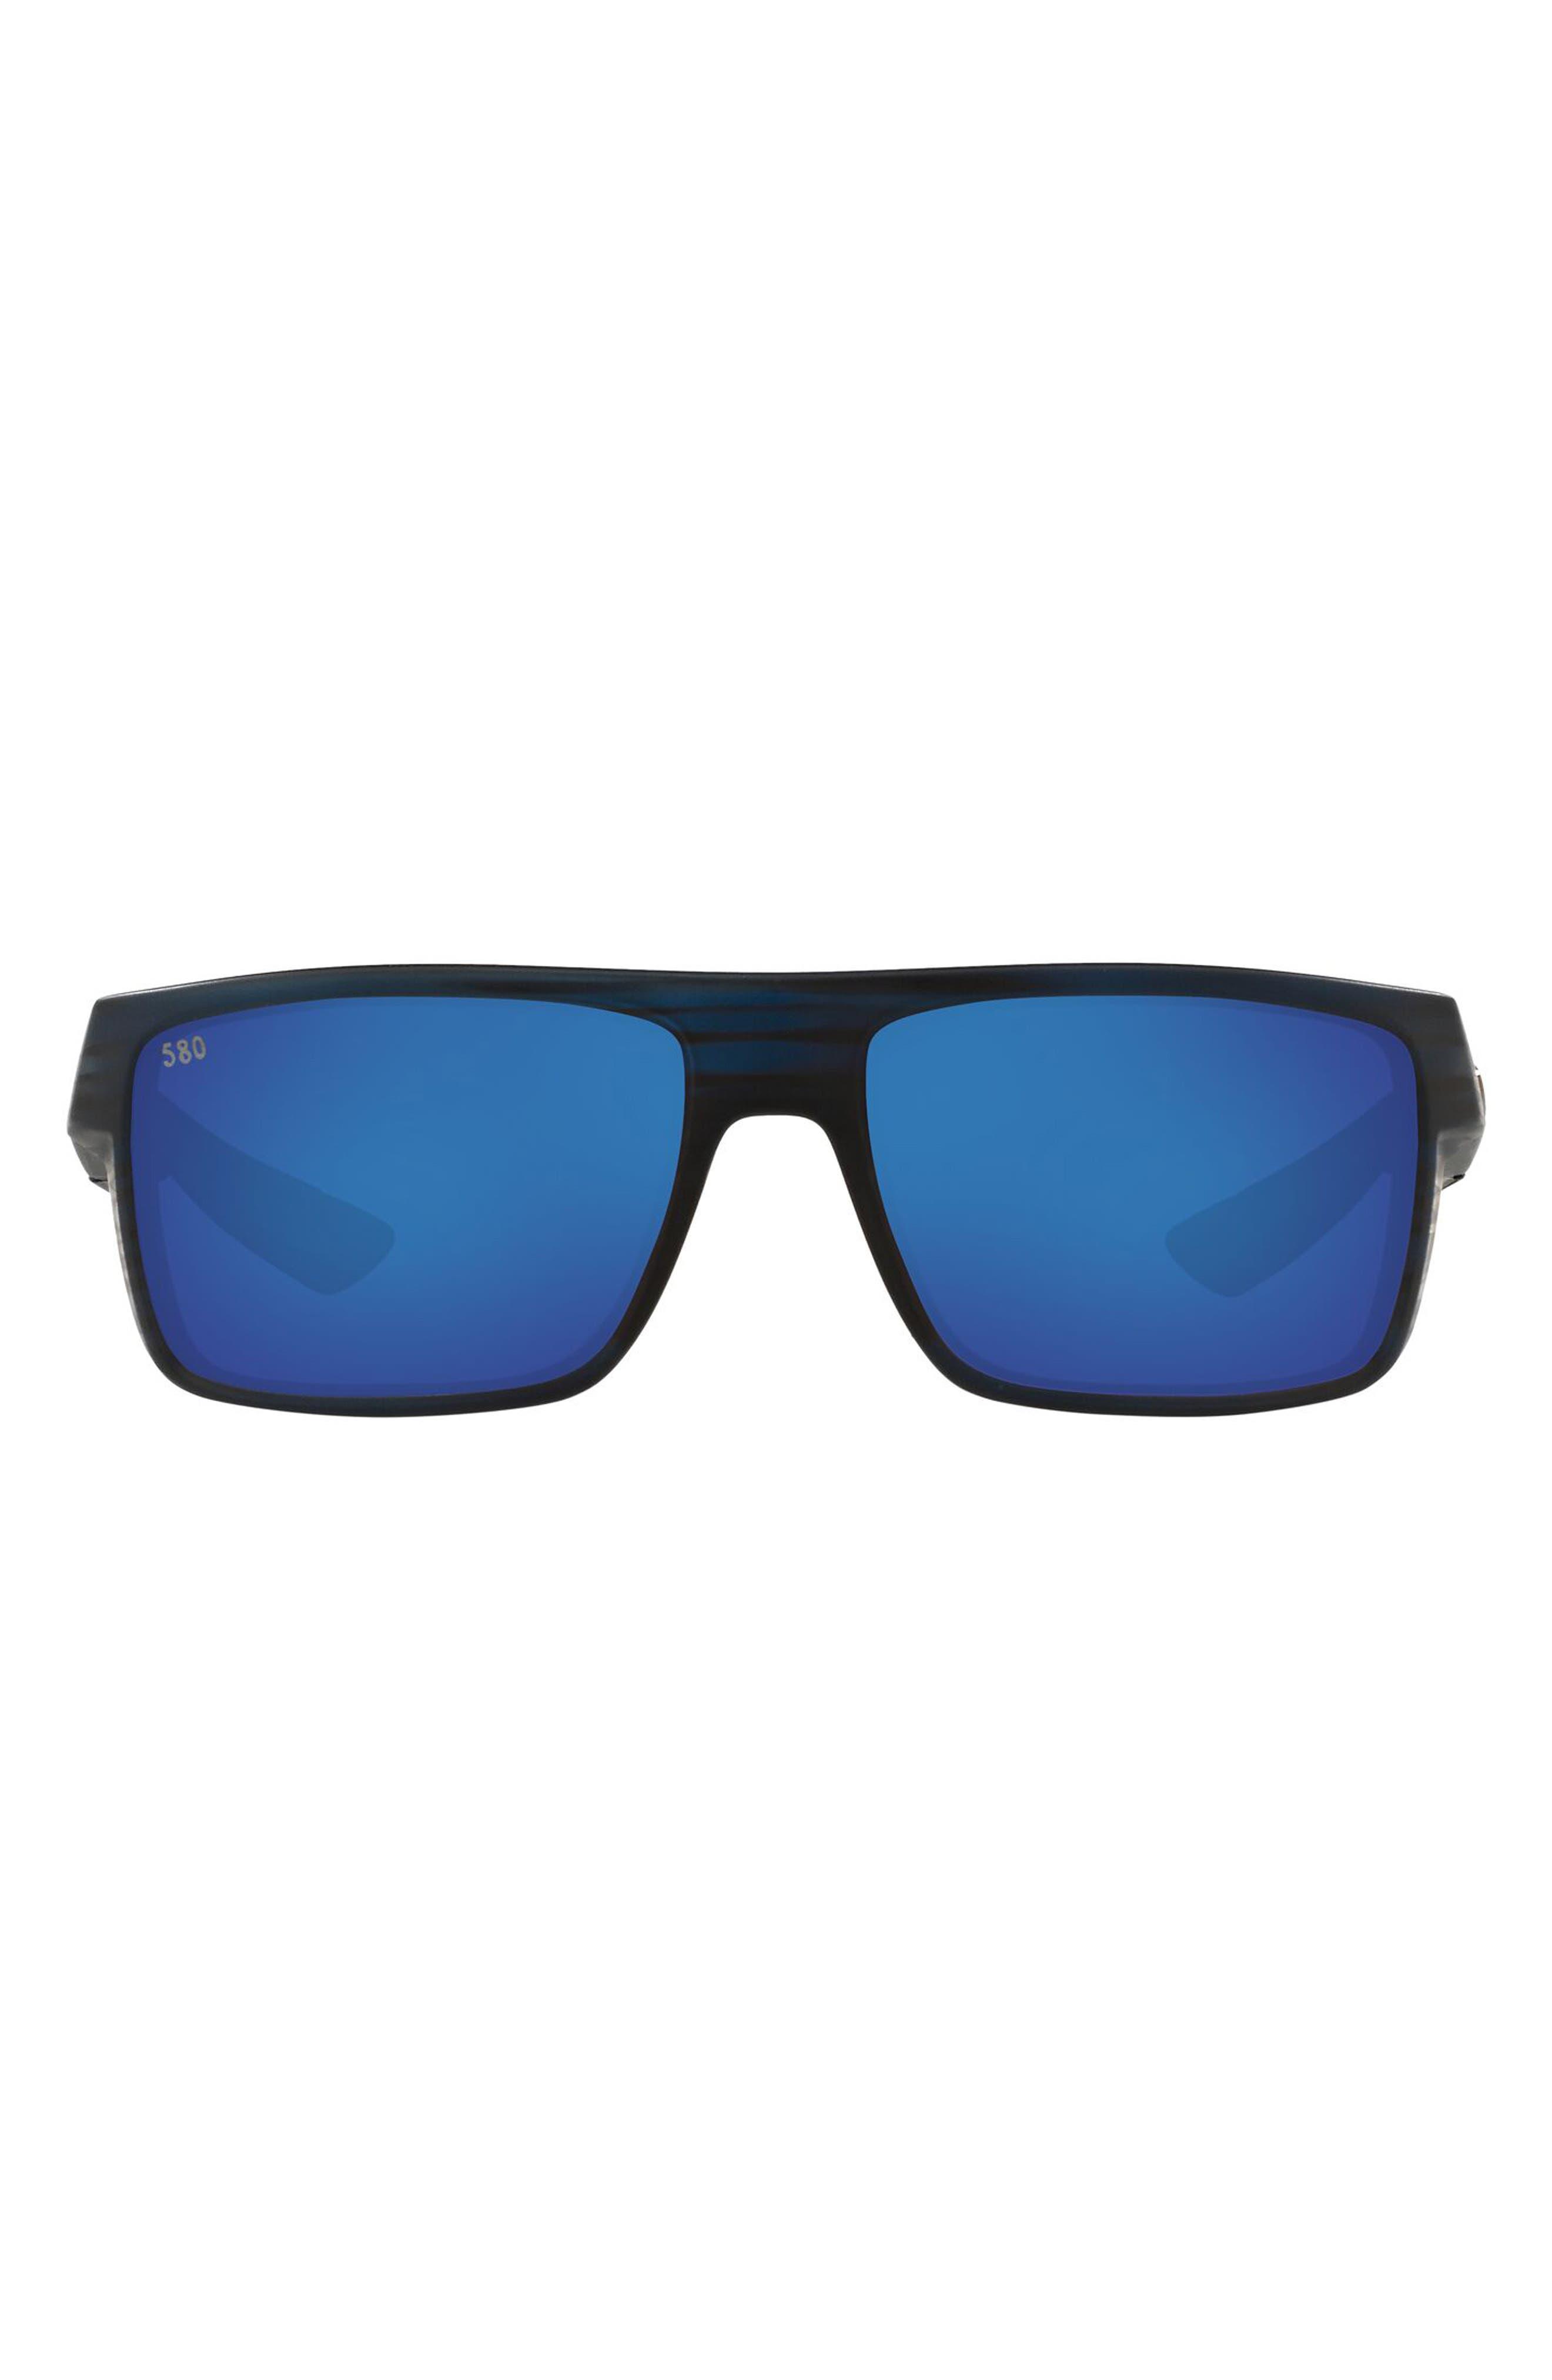 58mm Polarized Square Sunglasses